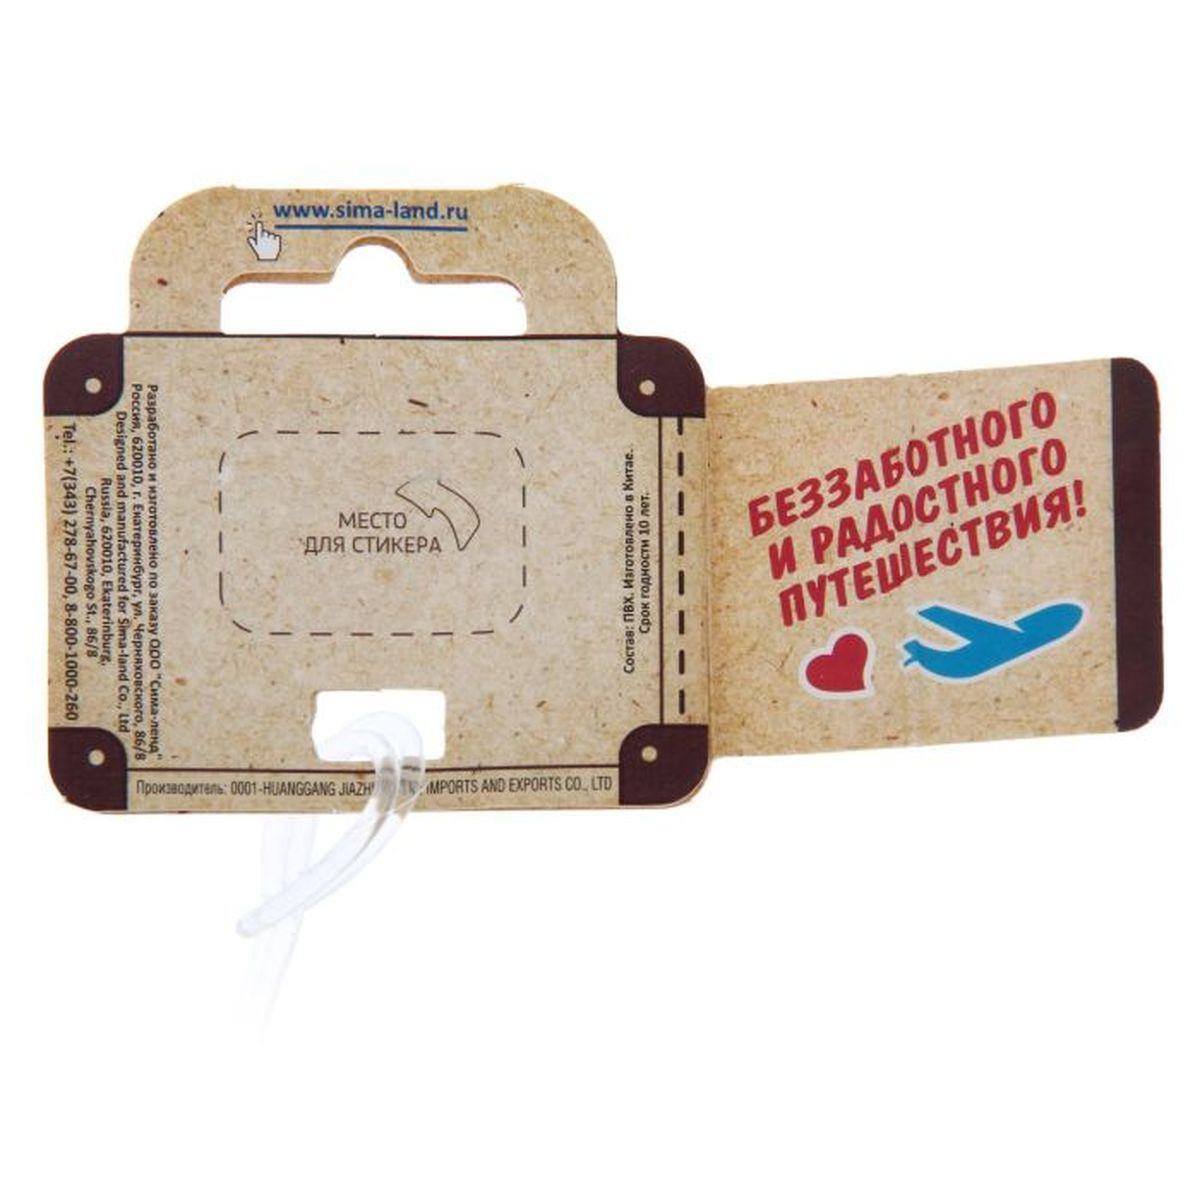 "Бирка на чемодан Sima-land ""Оберег от потери"", 6,6 х 10 см. 1144511"